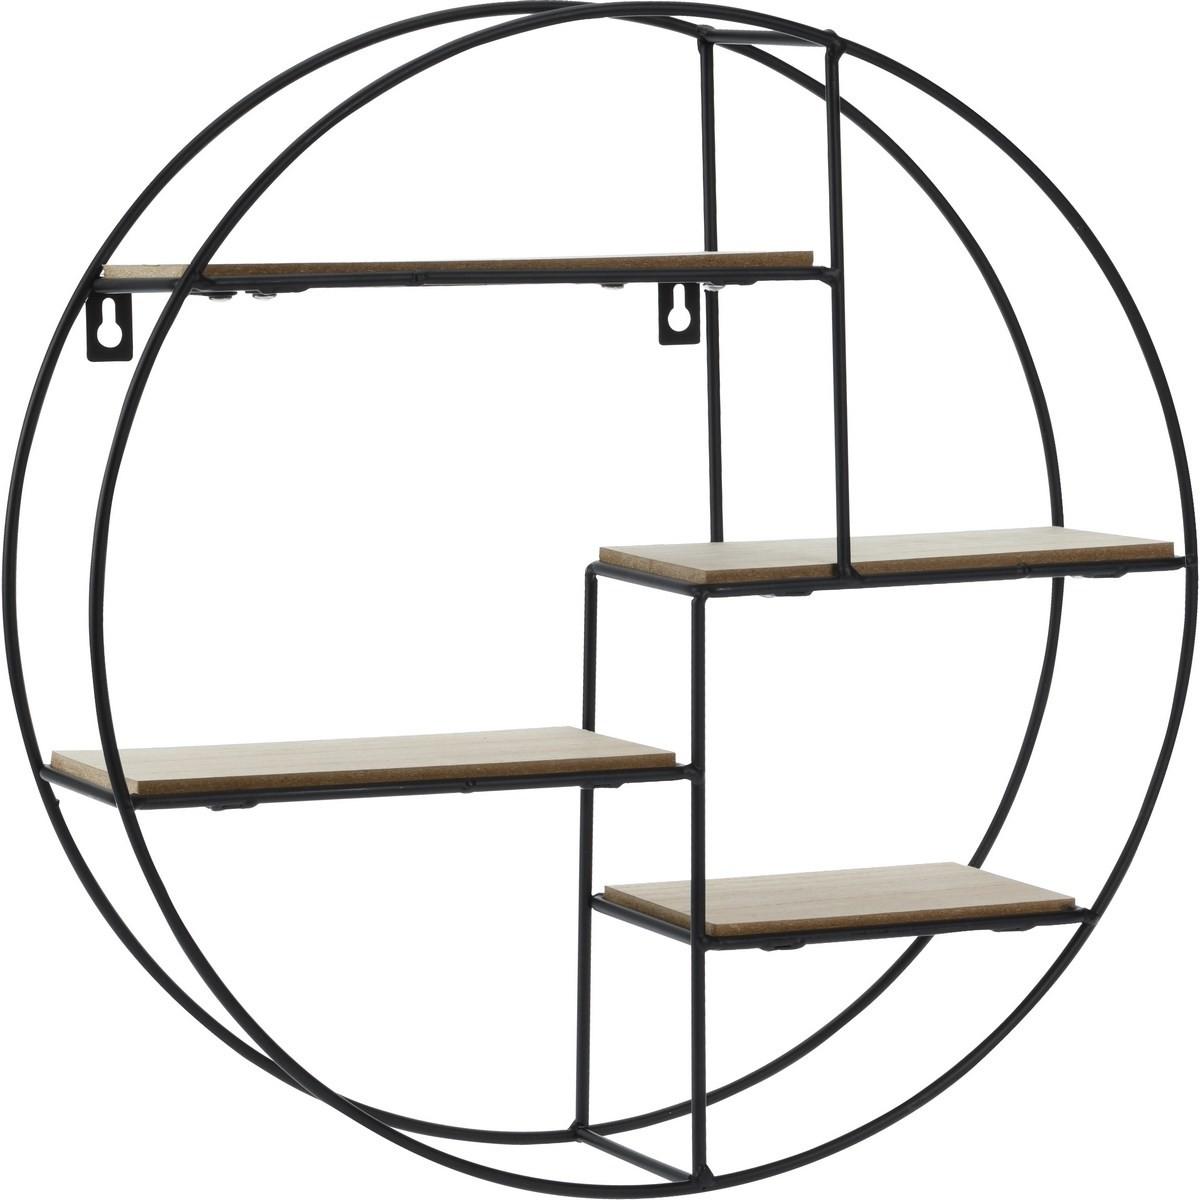 Okrągła półka Circulo, pr. 39,5 cm